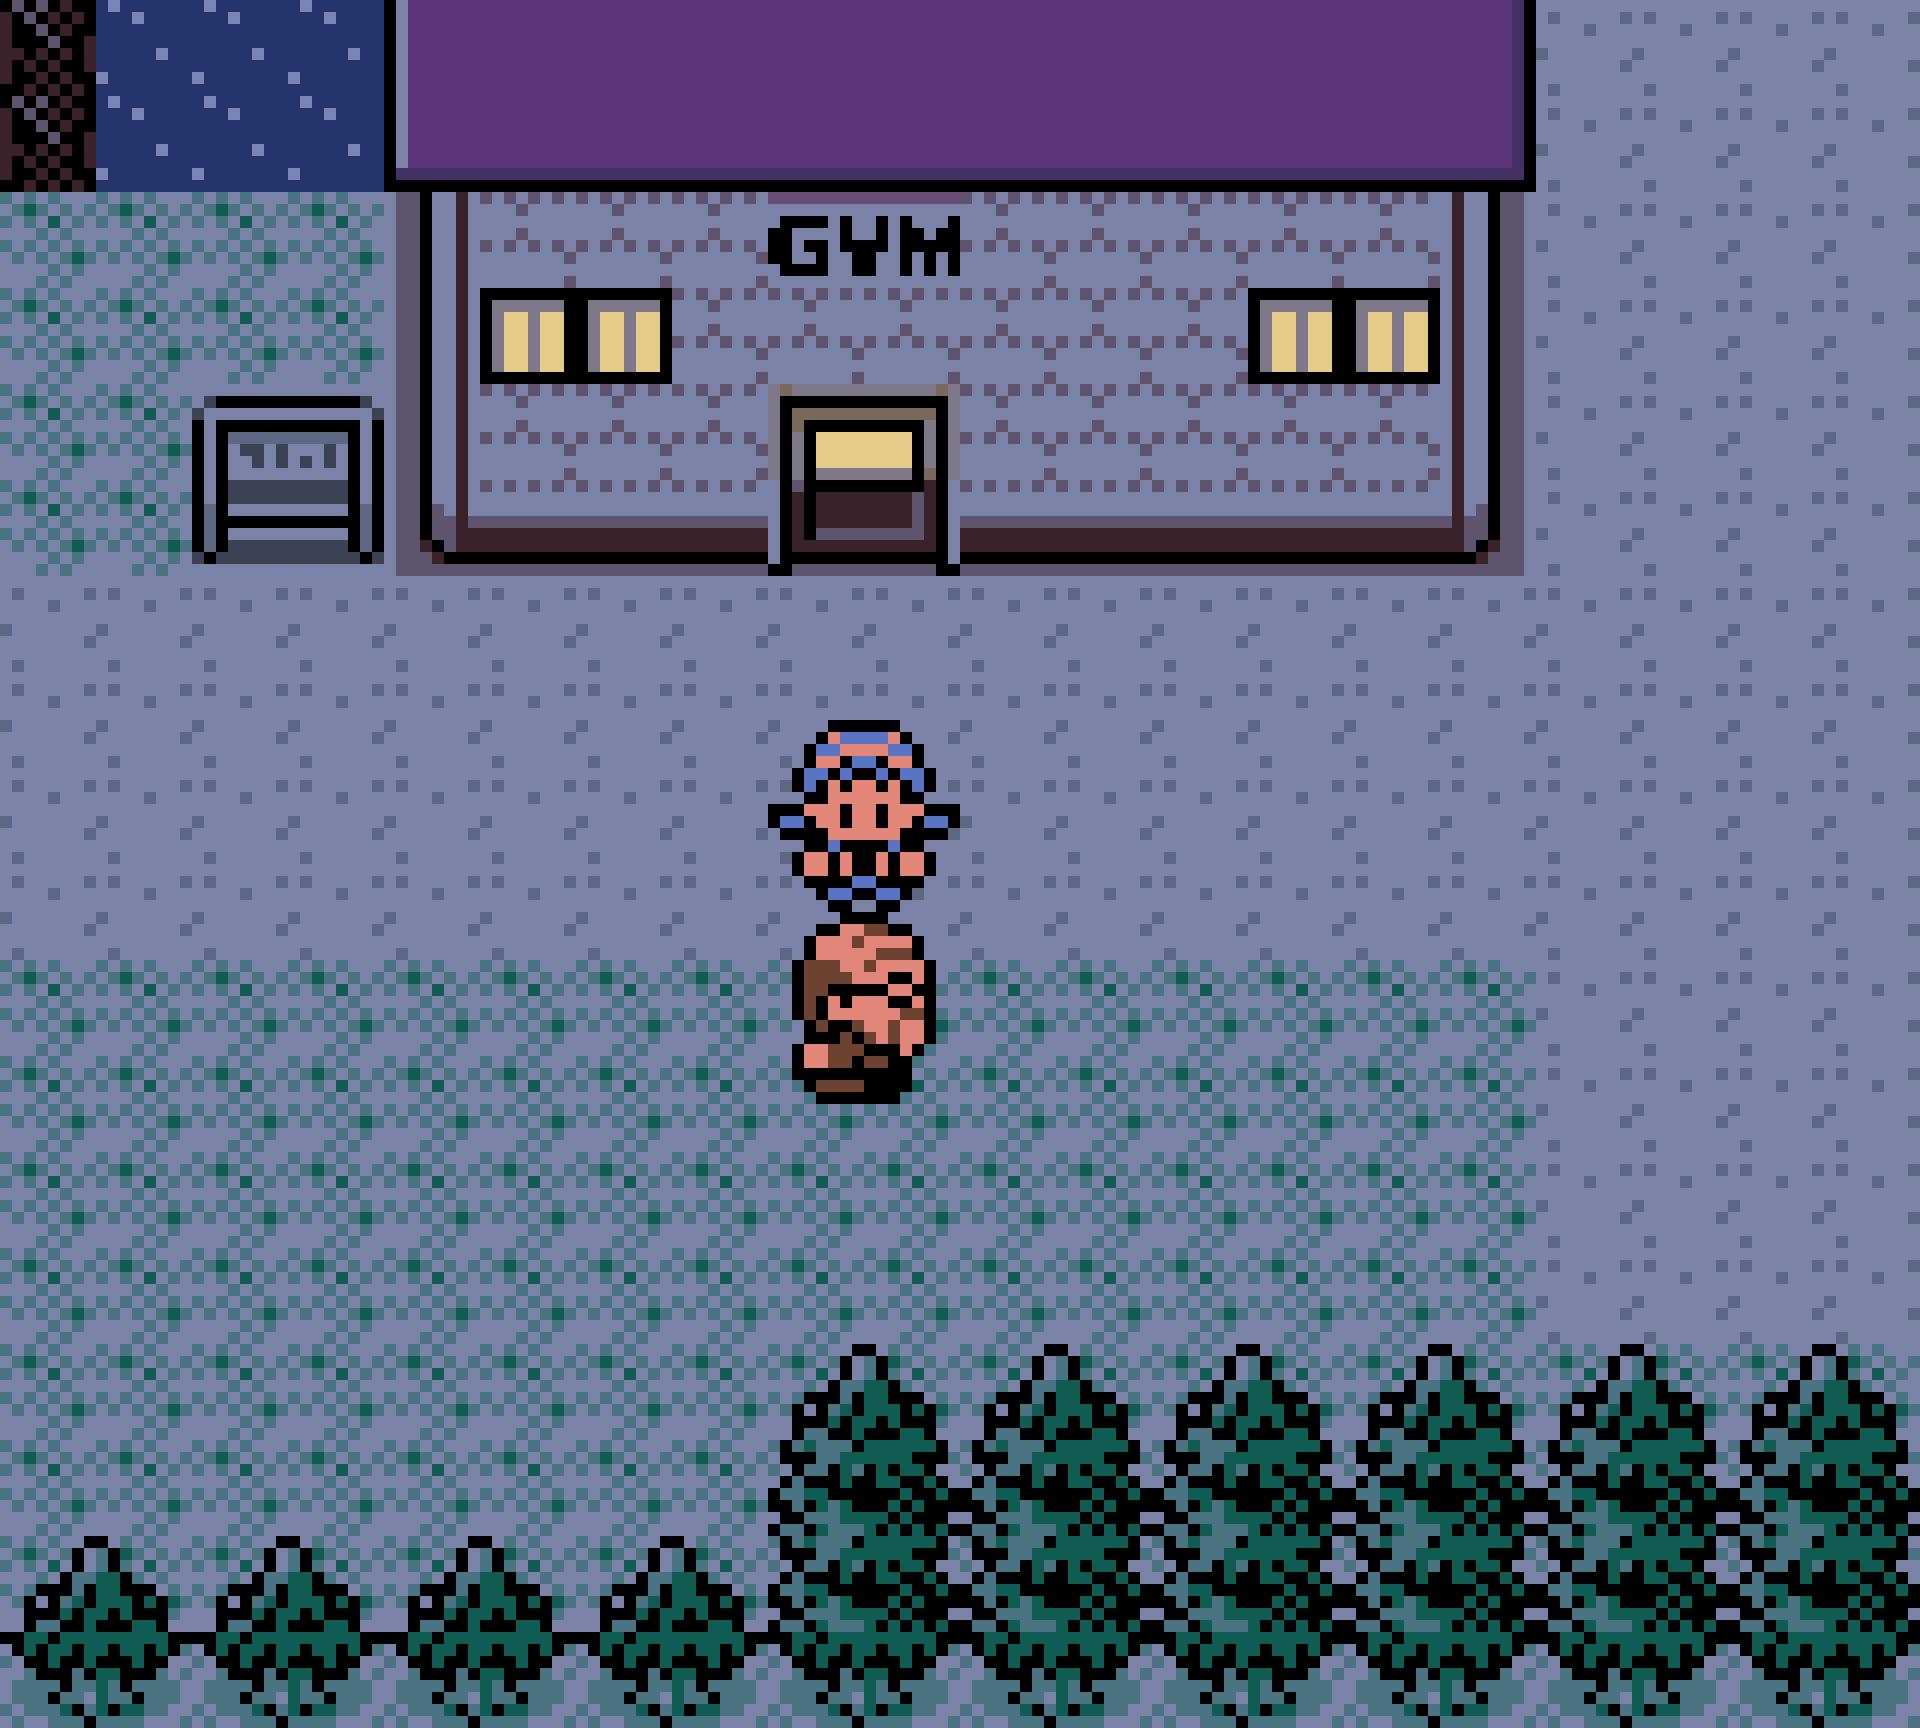 Pokemon_Crystal_Nuzlocke_2021-10-14_19.58.59.png